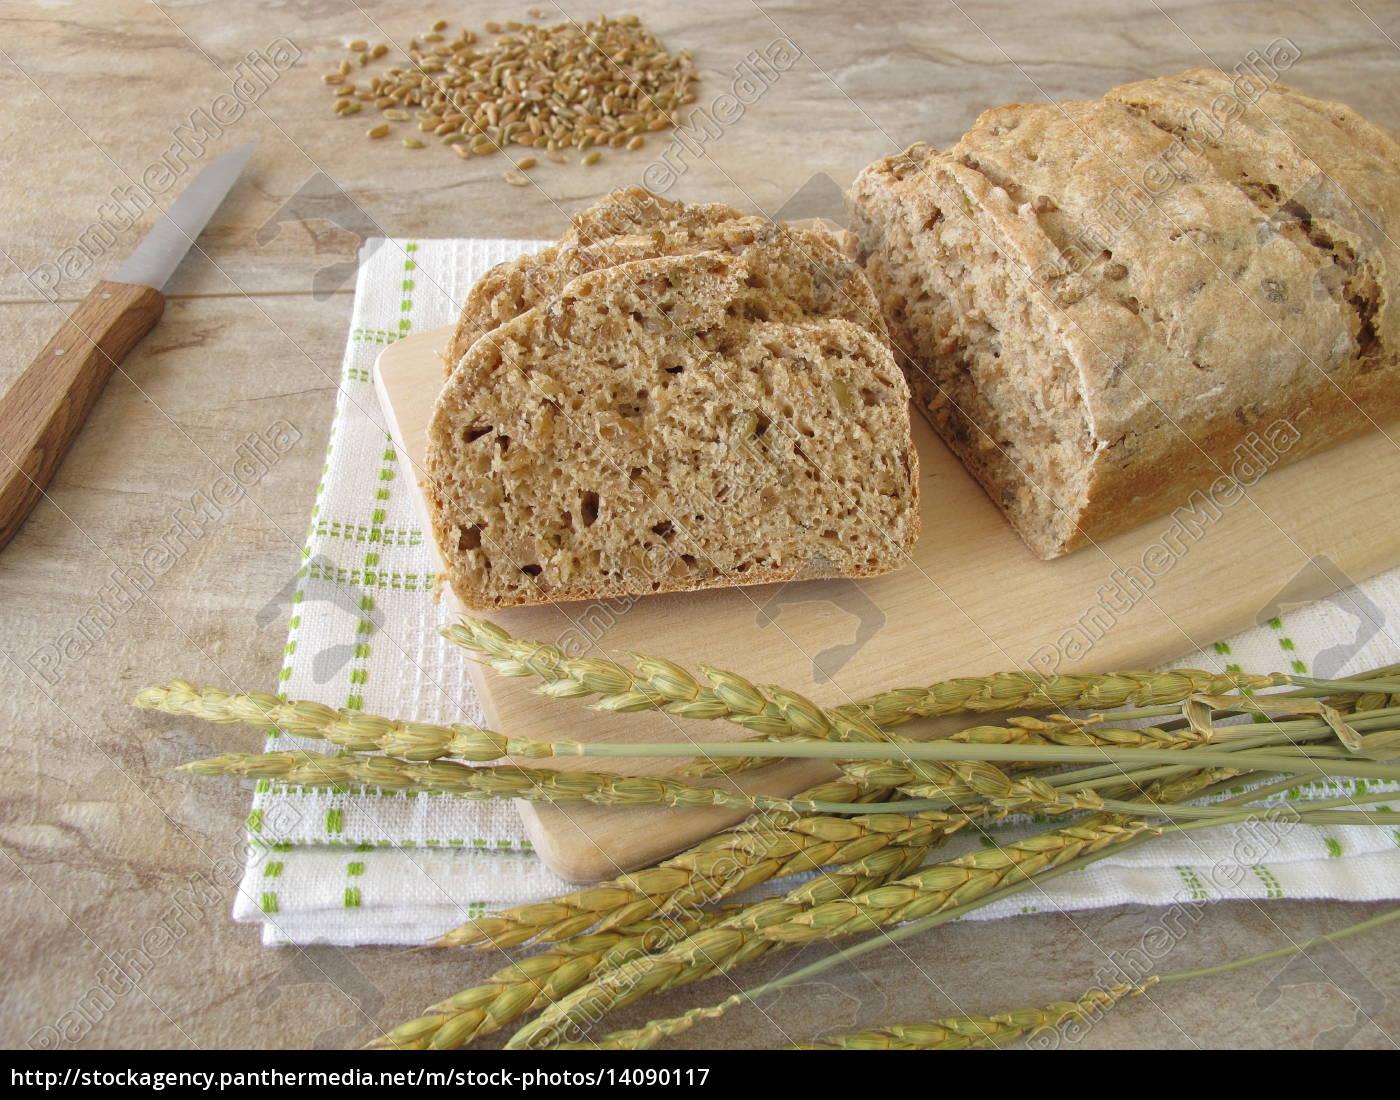 cut, green, core, bread - 14090117